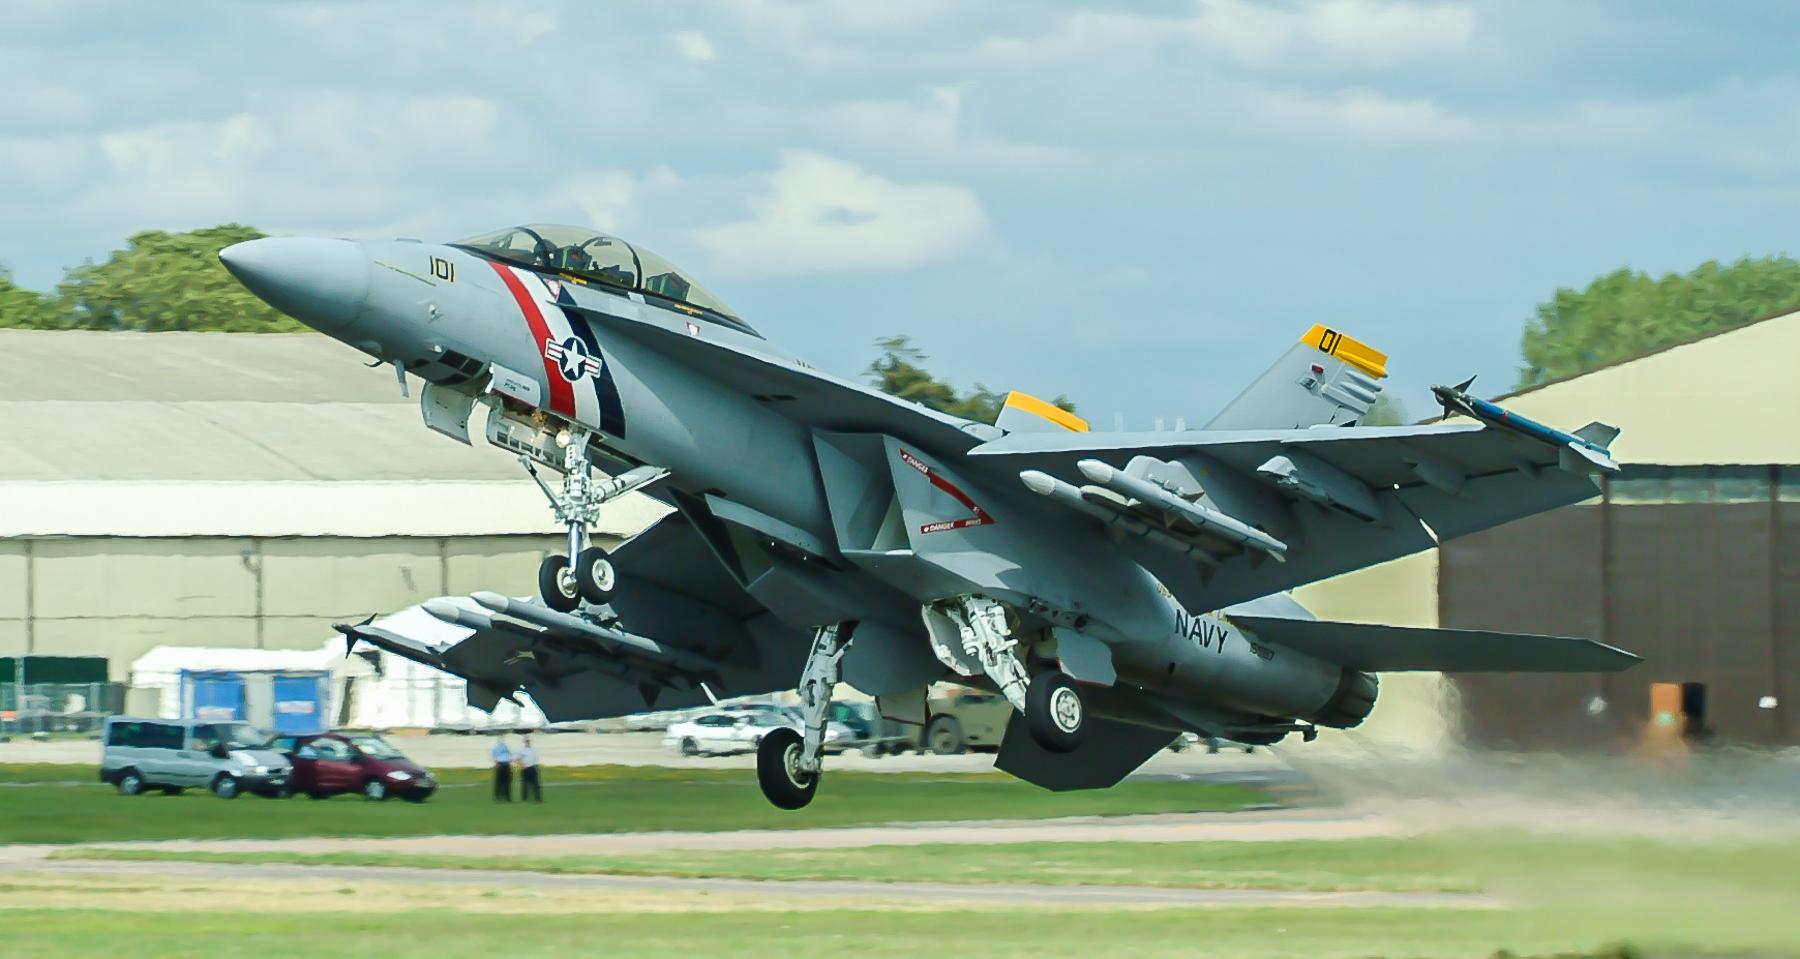 B016 Boeing F/A18 Super Hornet